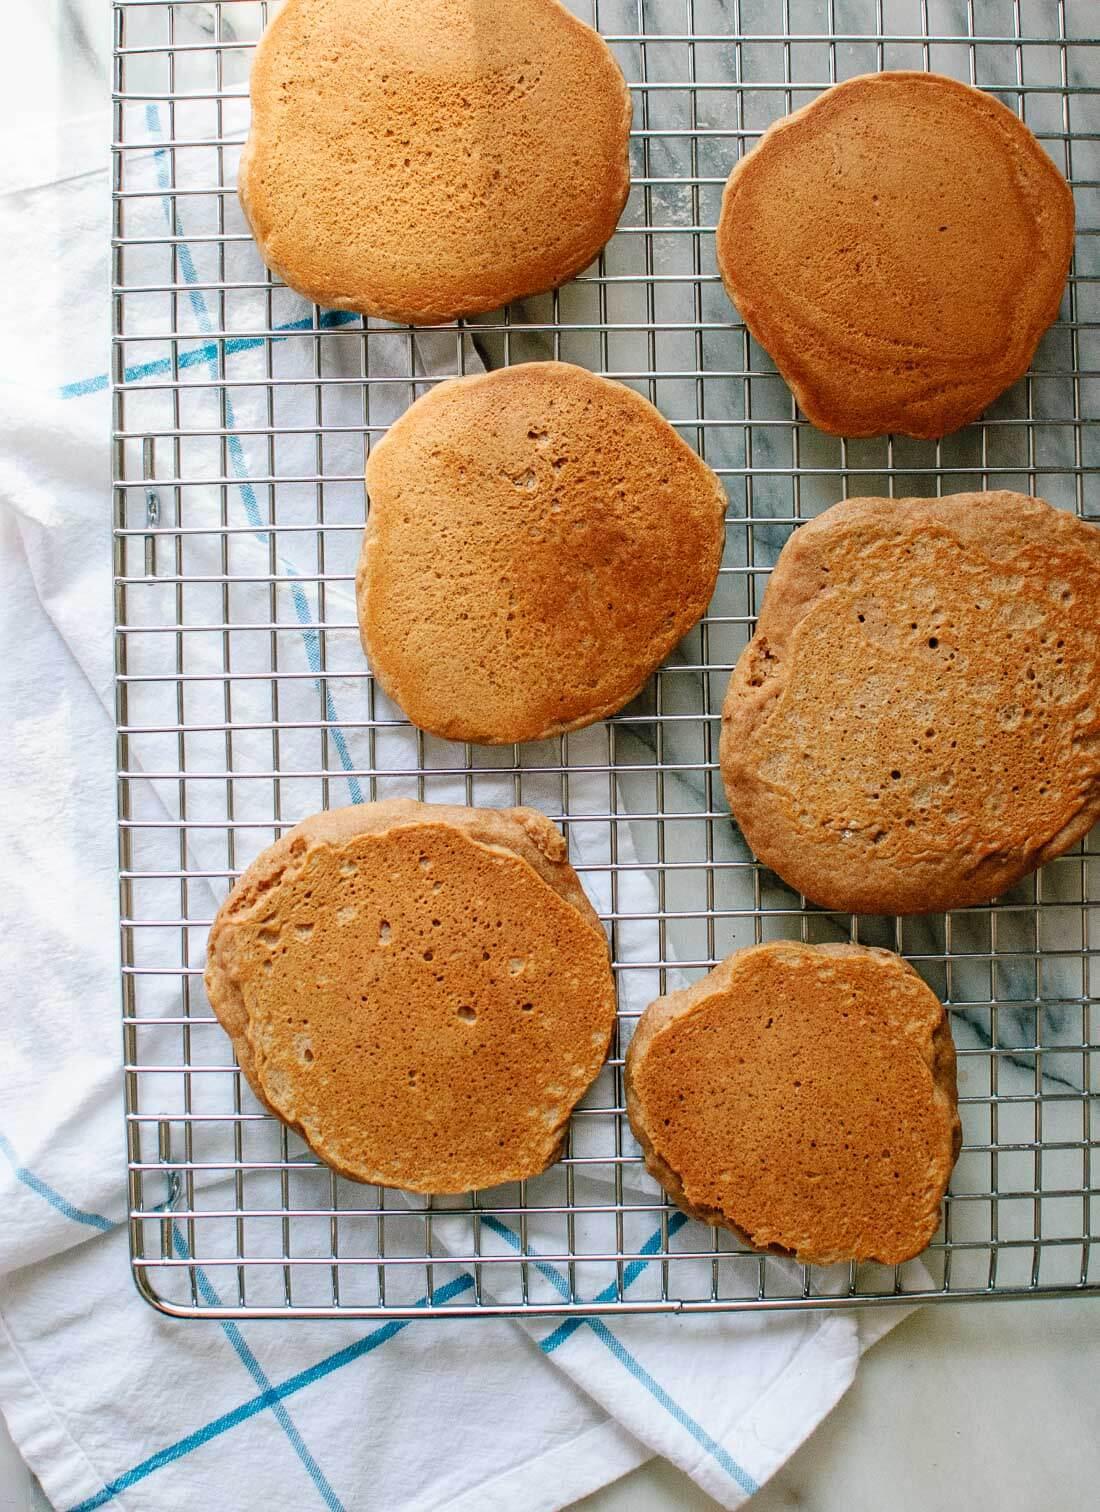 Easy vegan pancake recipe - cookieandkate.com